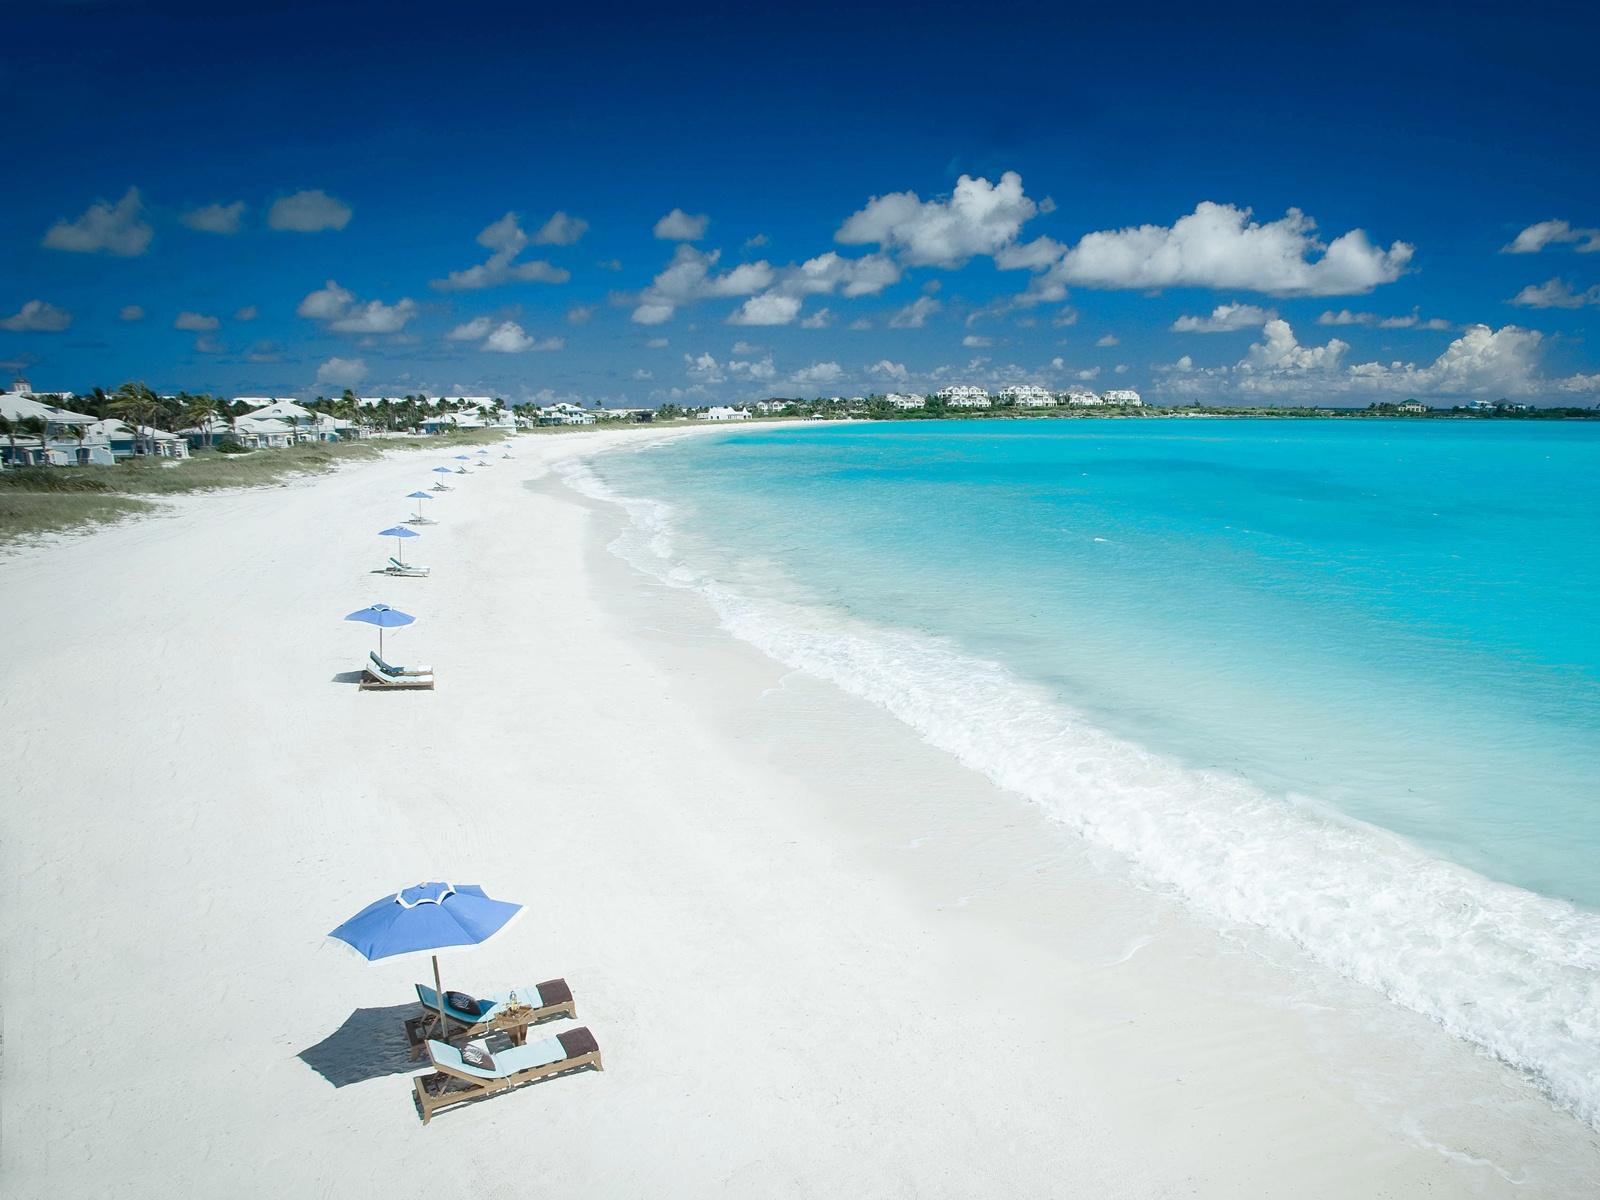 Bahamas Vacations On The Beach Yfgt